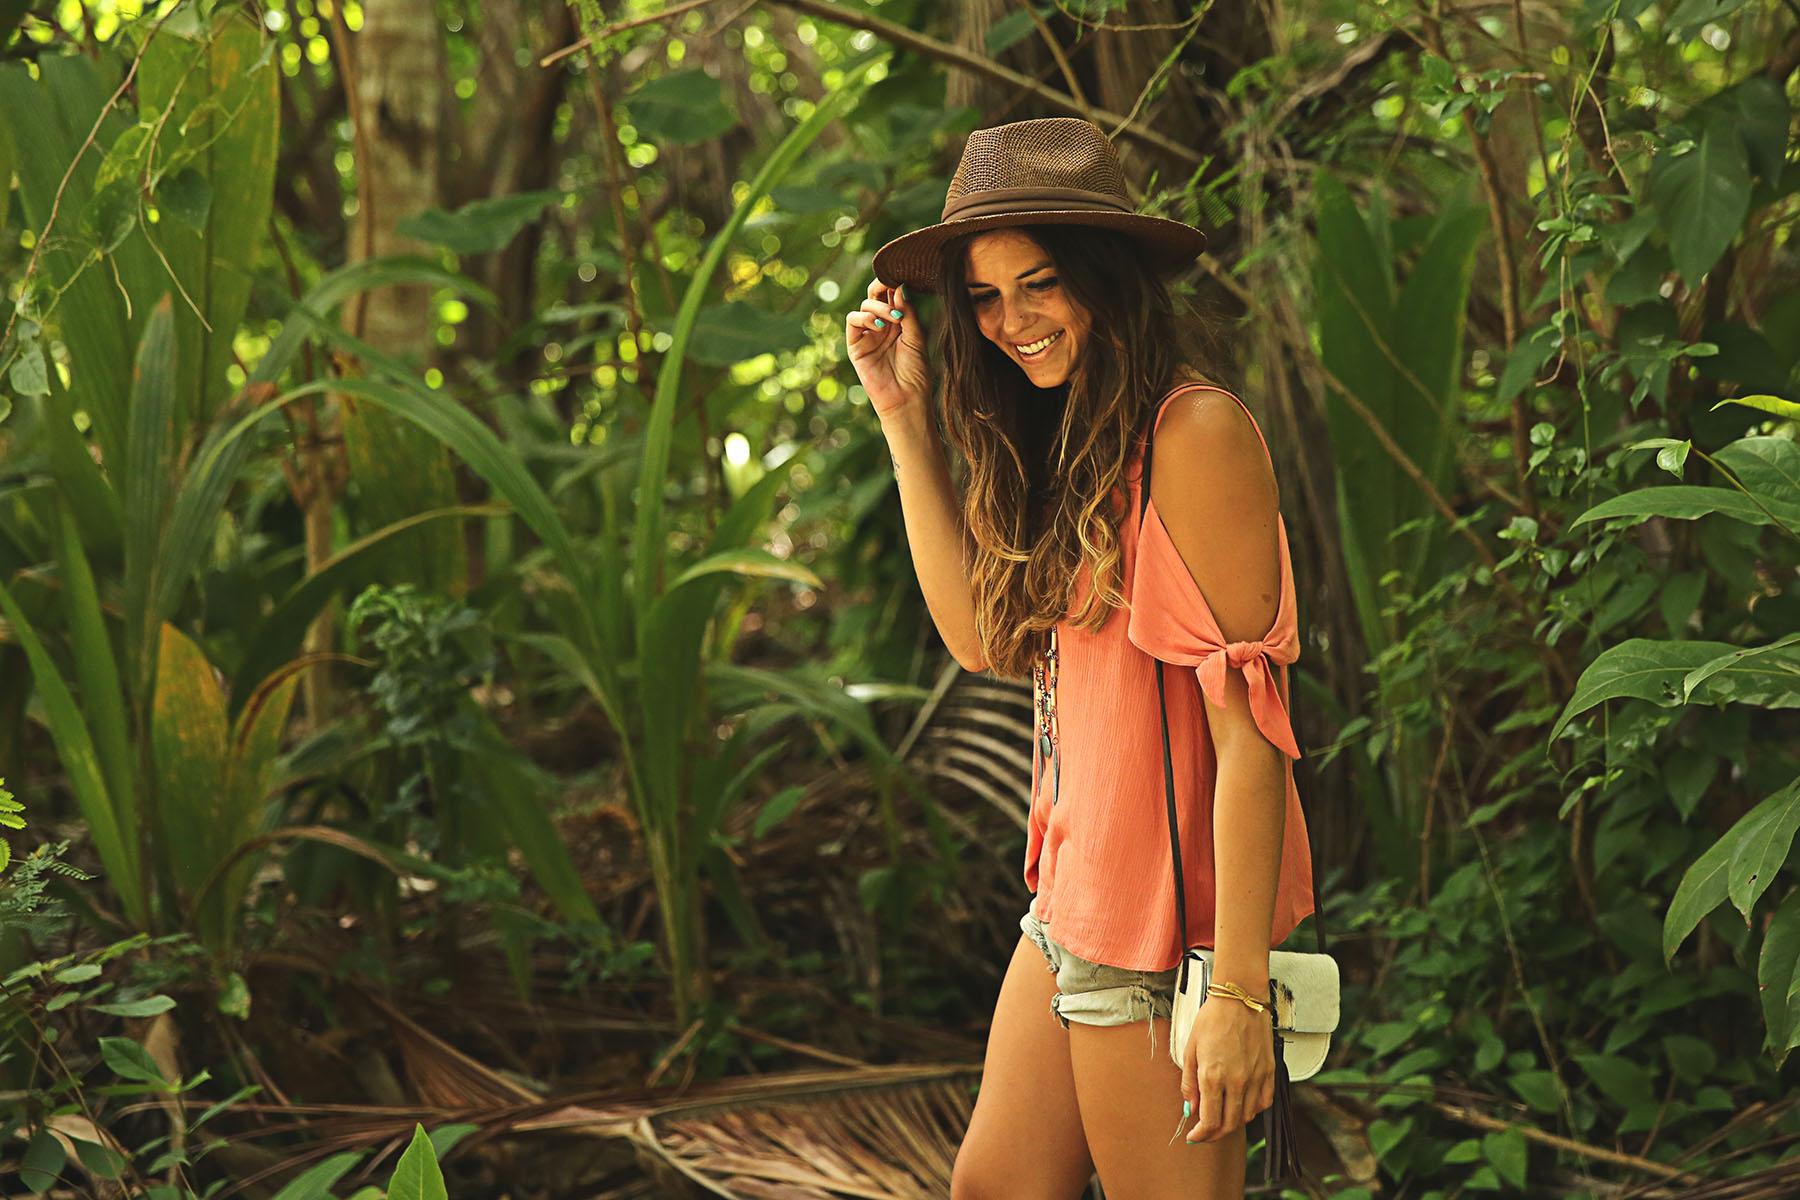 trendy-taste-look-outfit-street-style-ootd-blog-blogger-fashion-spain-moda-españa-boho-hippie-verano-birkenstock-bavaro-barcelo-khaki-caqui-shorts-sombrero-top-7